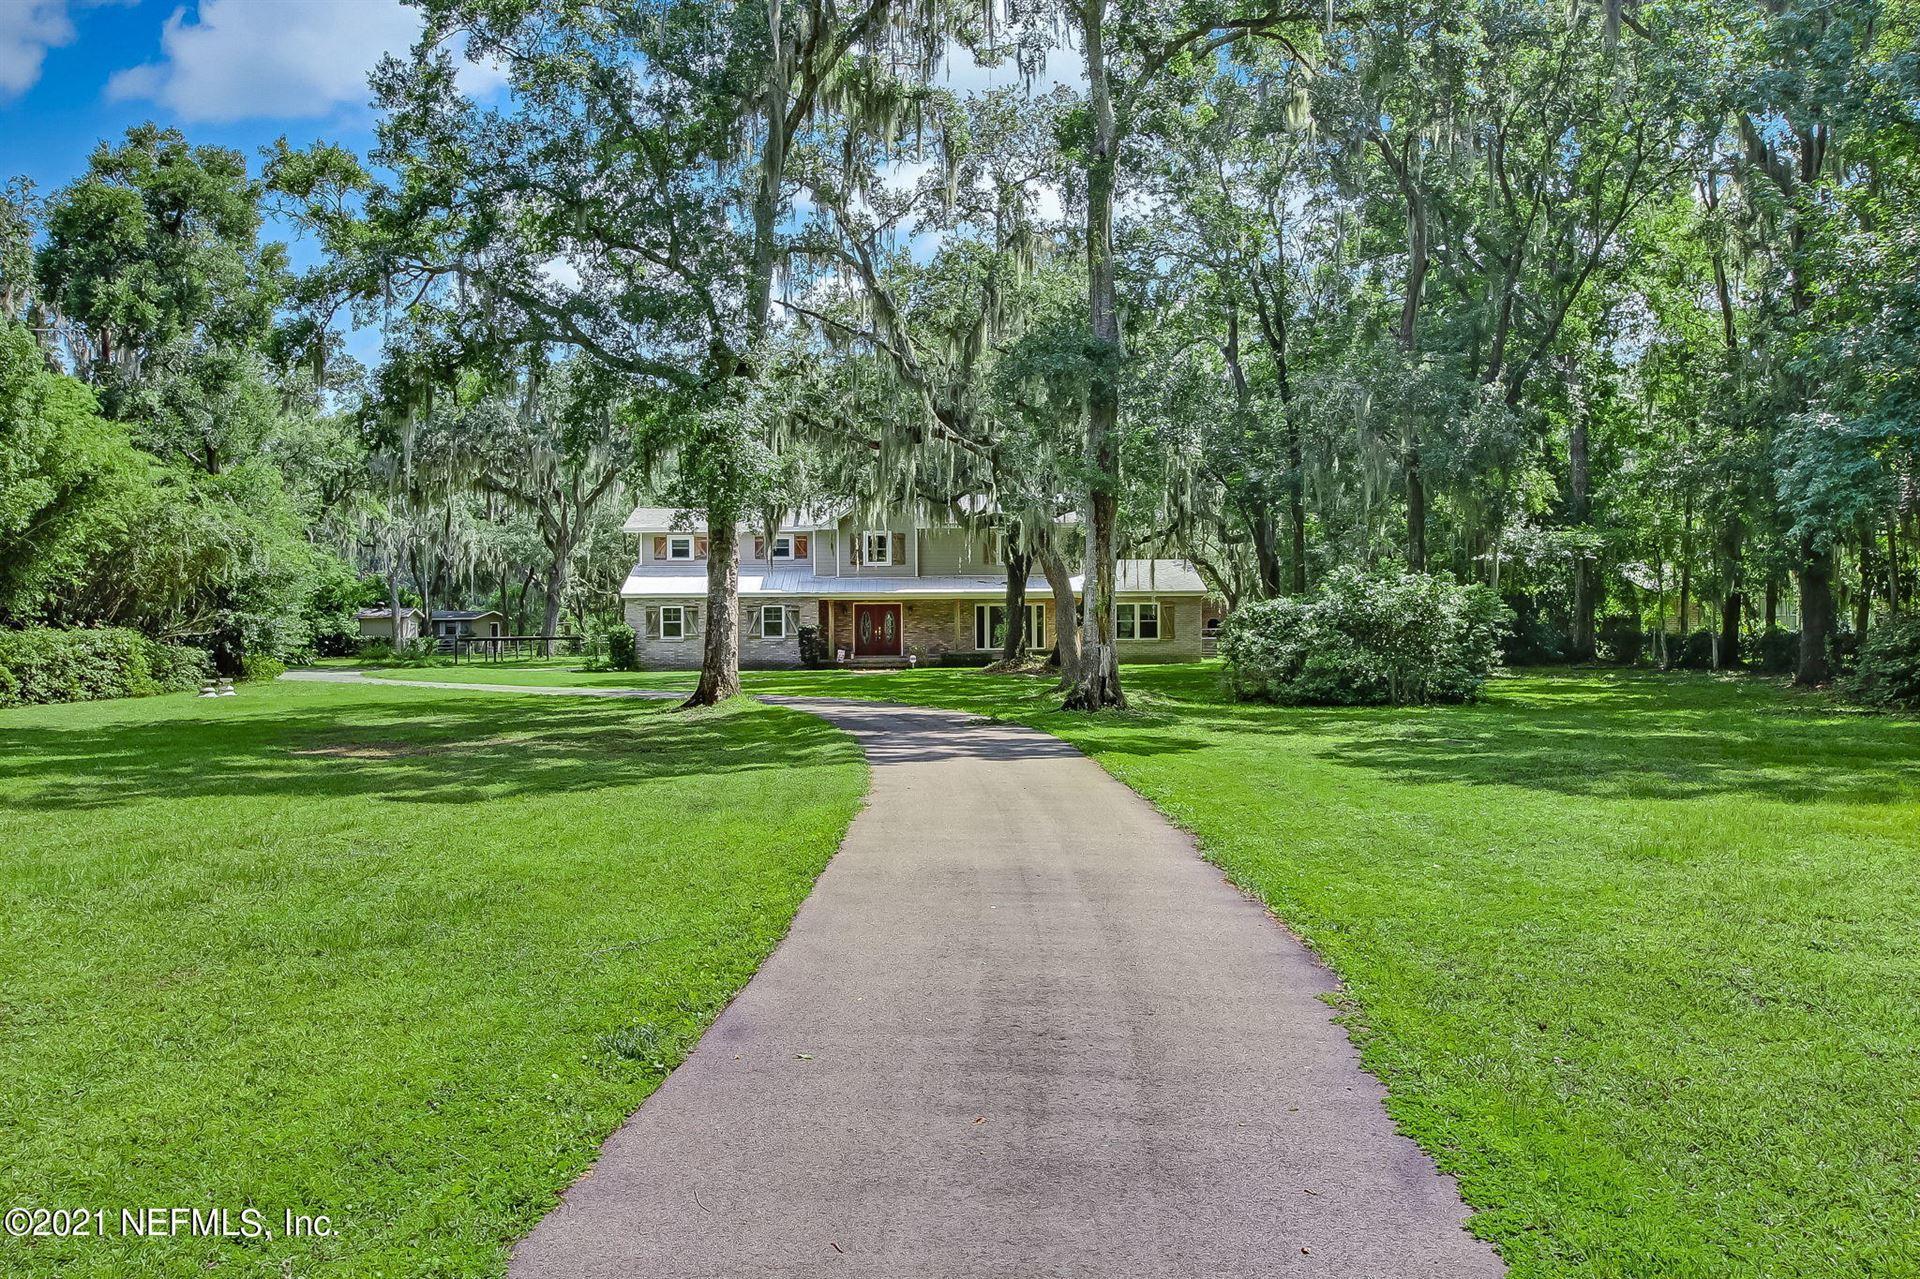 Photo of 13567 MANDARIN RD #Unit No: 0 Lot No: 3, JACKSONVILLE, FL 32223 (MLS # 1122437)